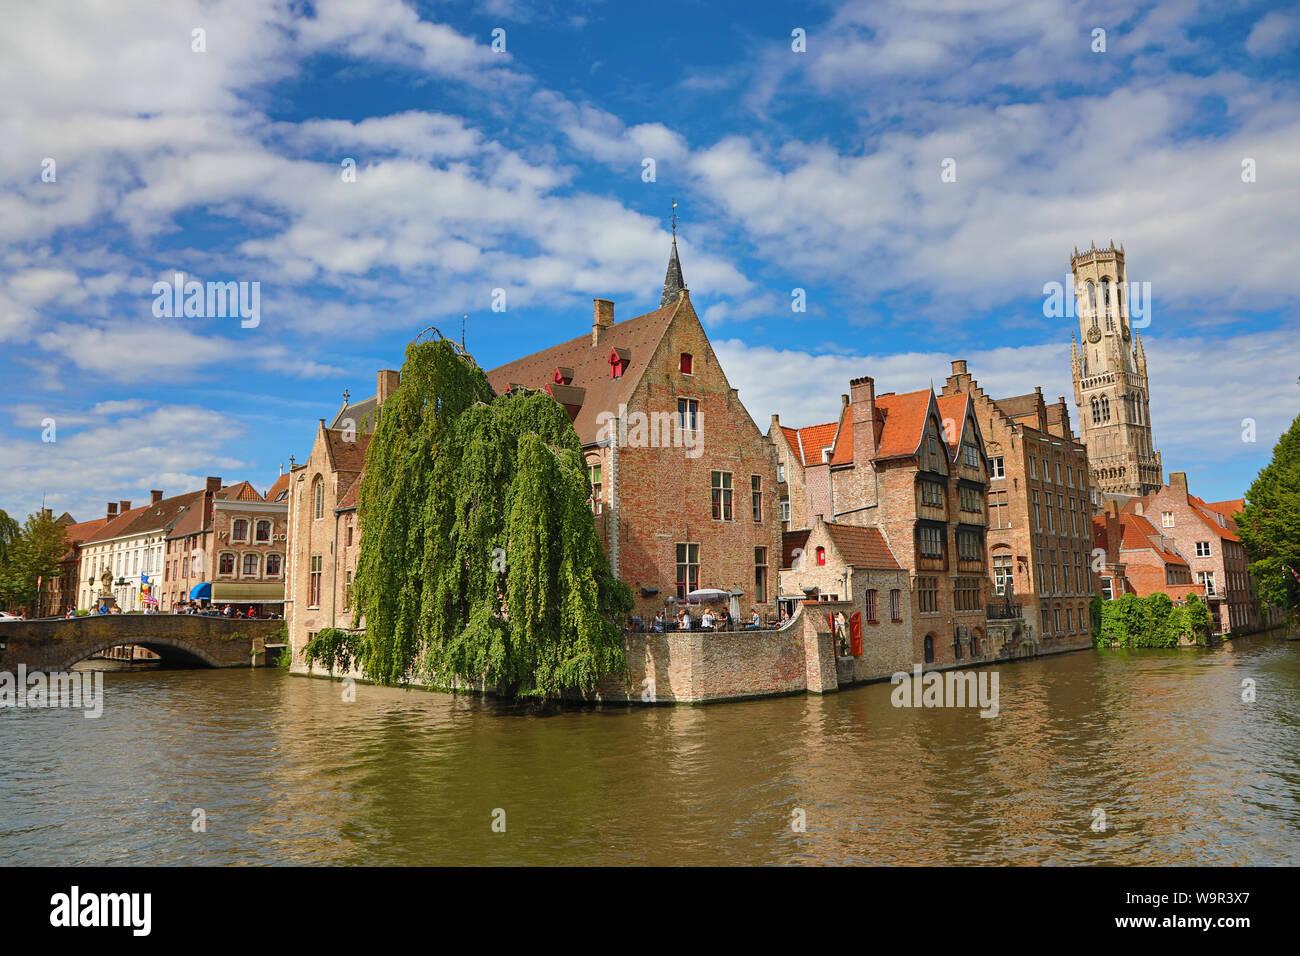 Kai Rosenkranz oder rozenhoedkaai und der Glockenturm, Brügge, Belgien Stockfoto